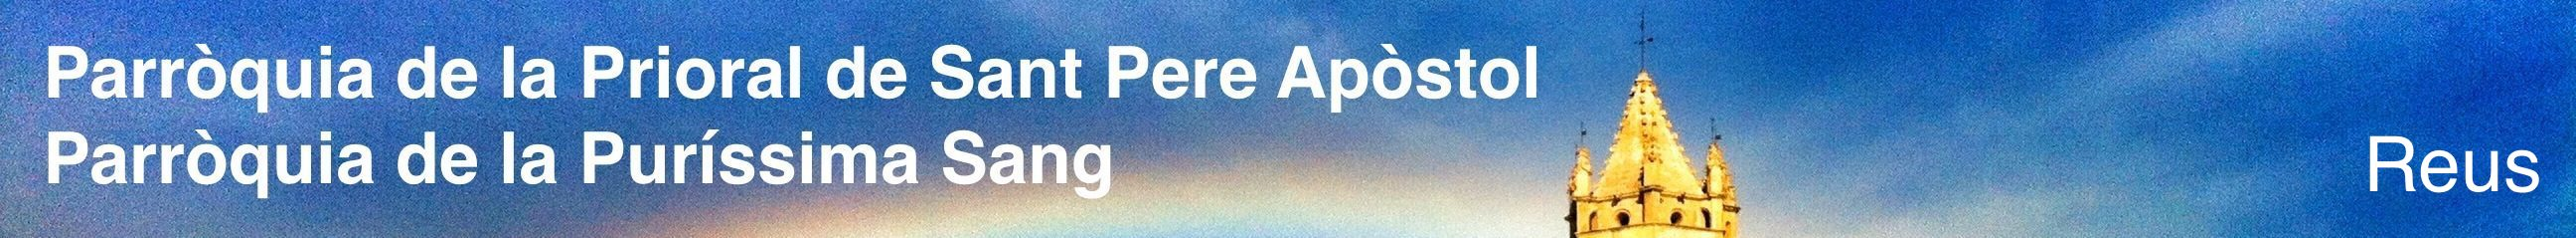 Parròquies de St. Pere Apòstol i de la Puríssima Sang